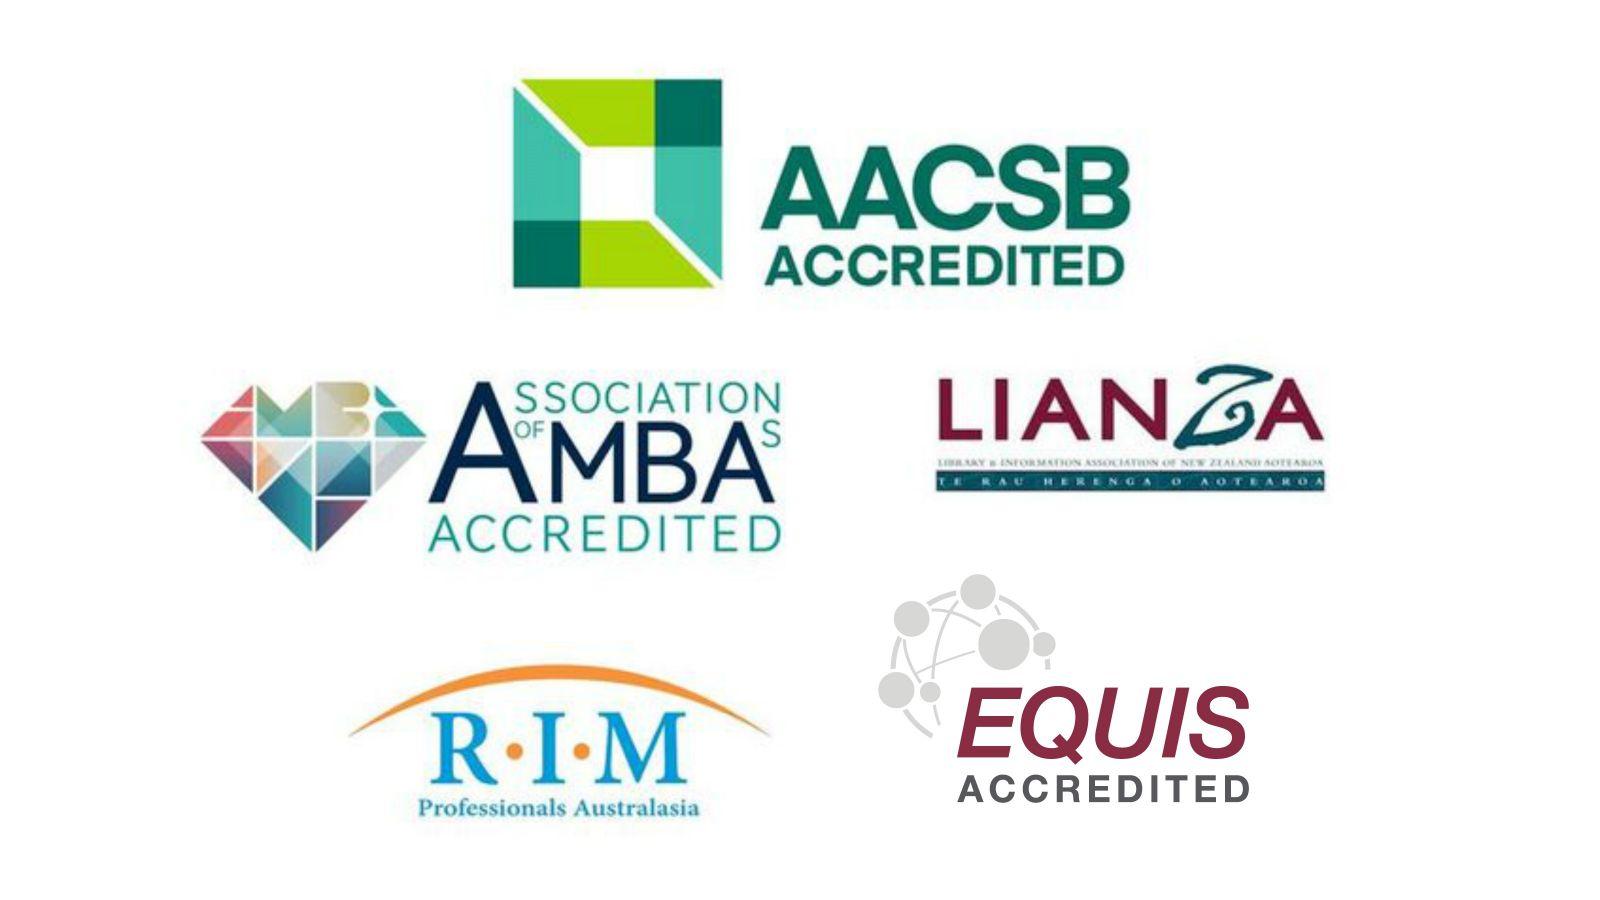 Logo – AACSB, AMBA, LIANZA, RIM and EQUIS.